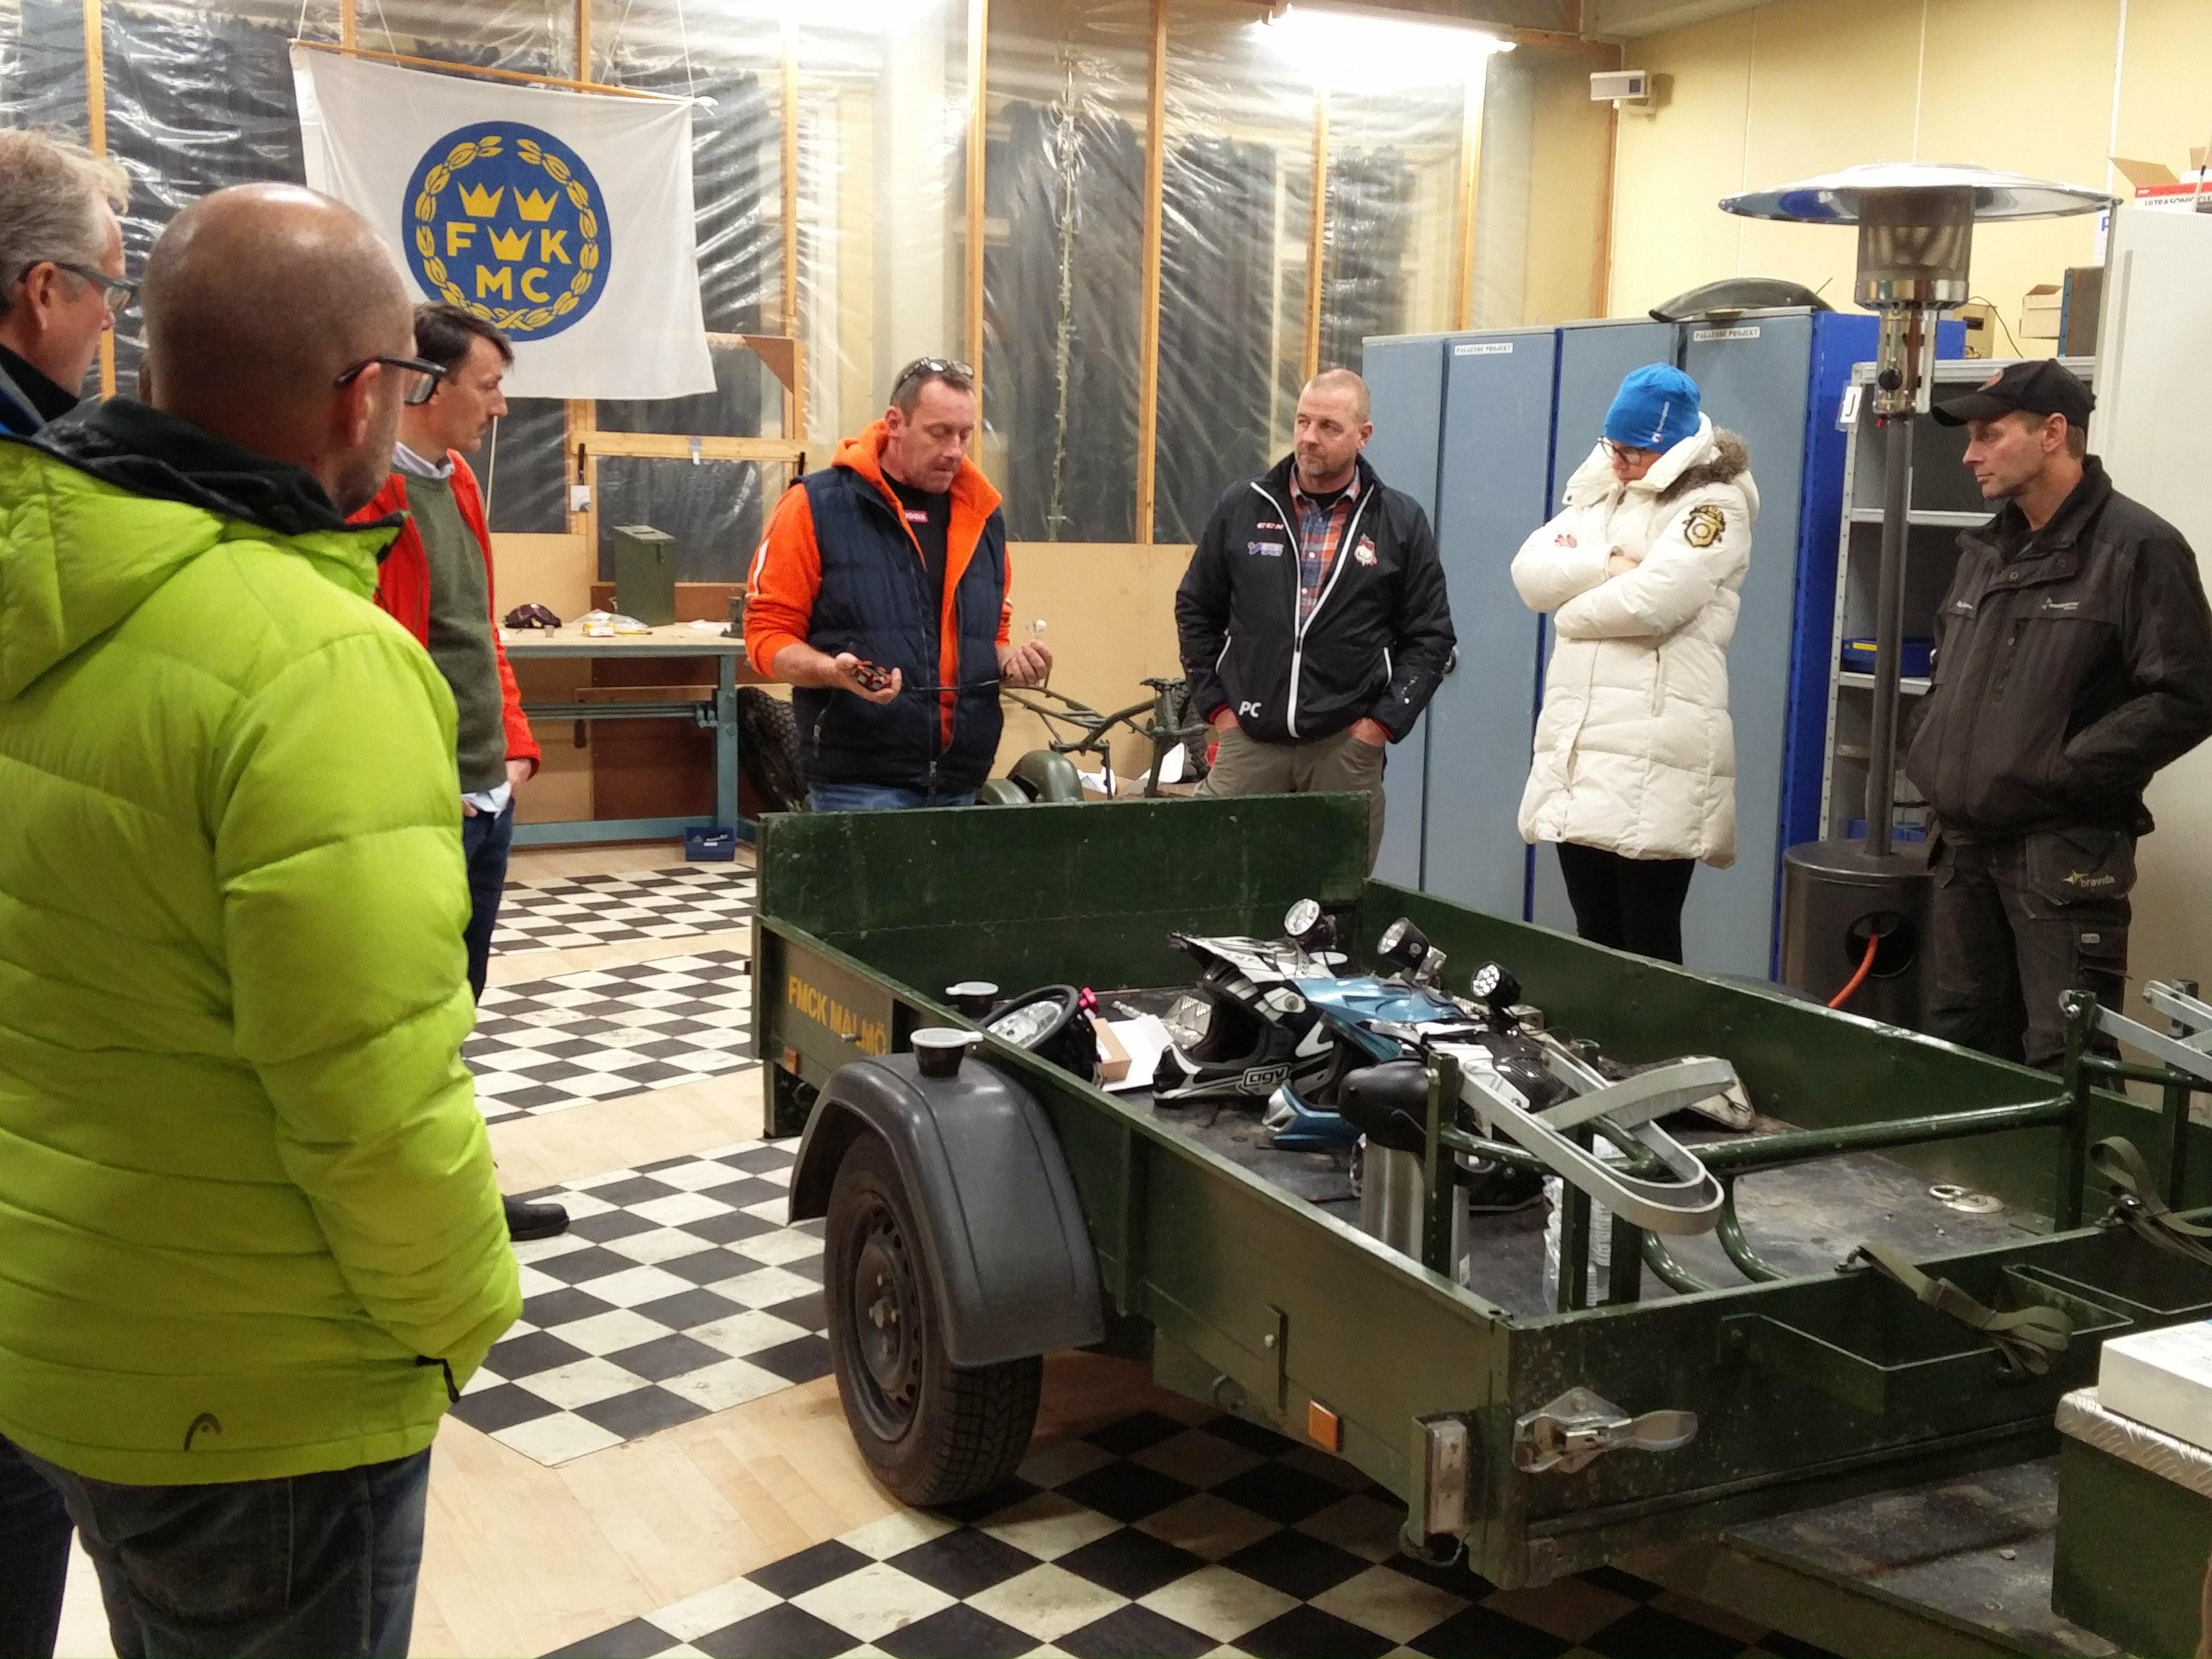 2016-10-13-morkerkurs-robothallen